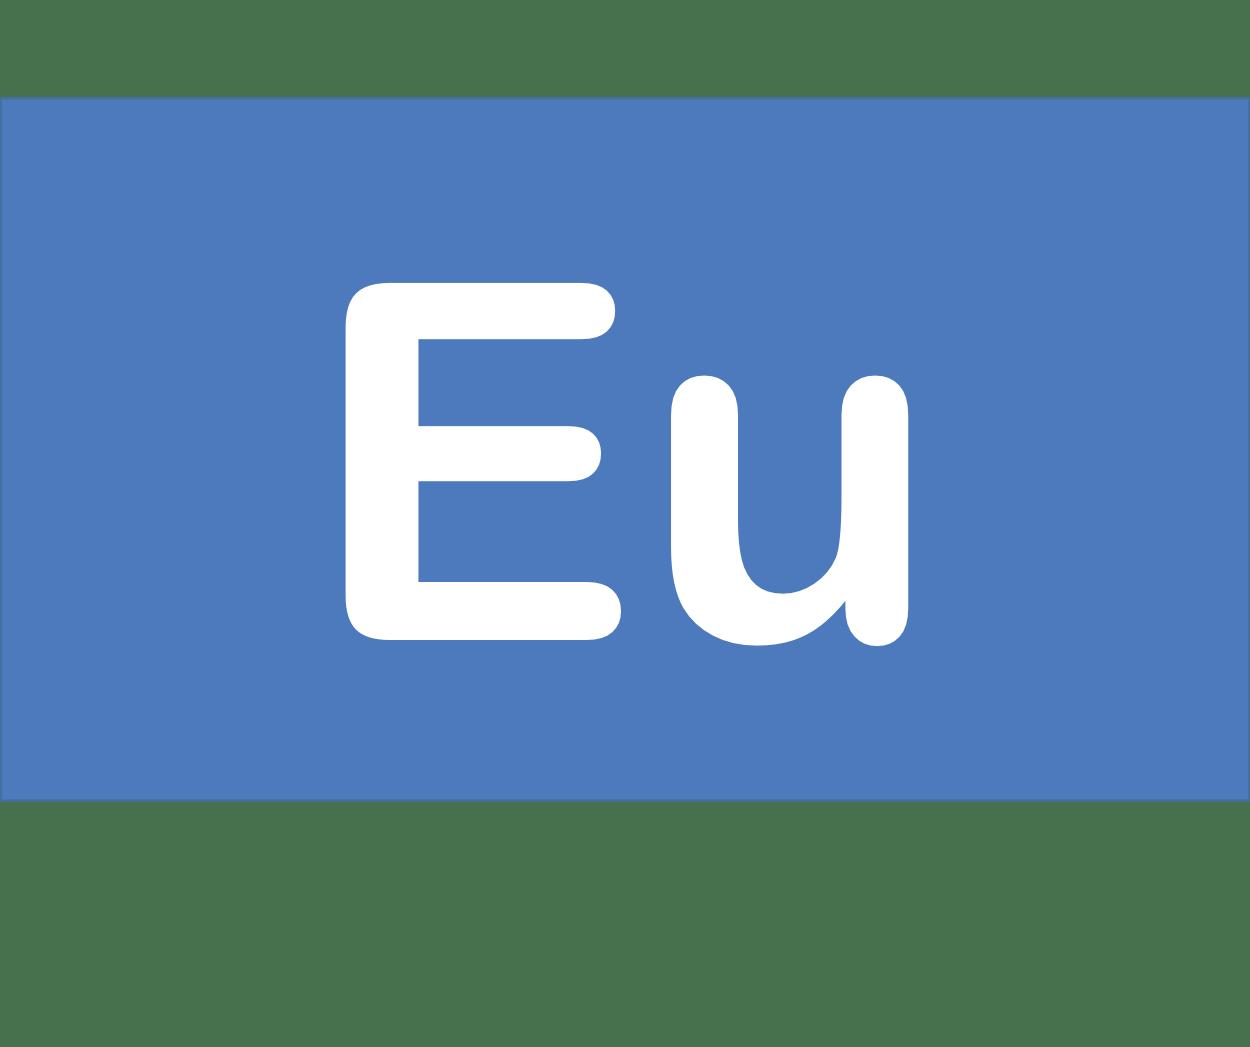 63 Eu ユウロピウム Europium 元素 記号 周期表 化学 原子